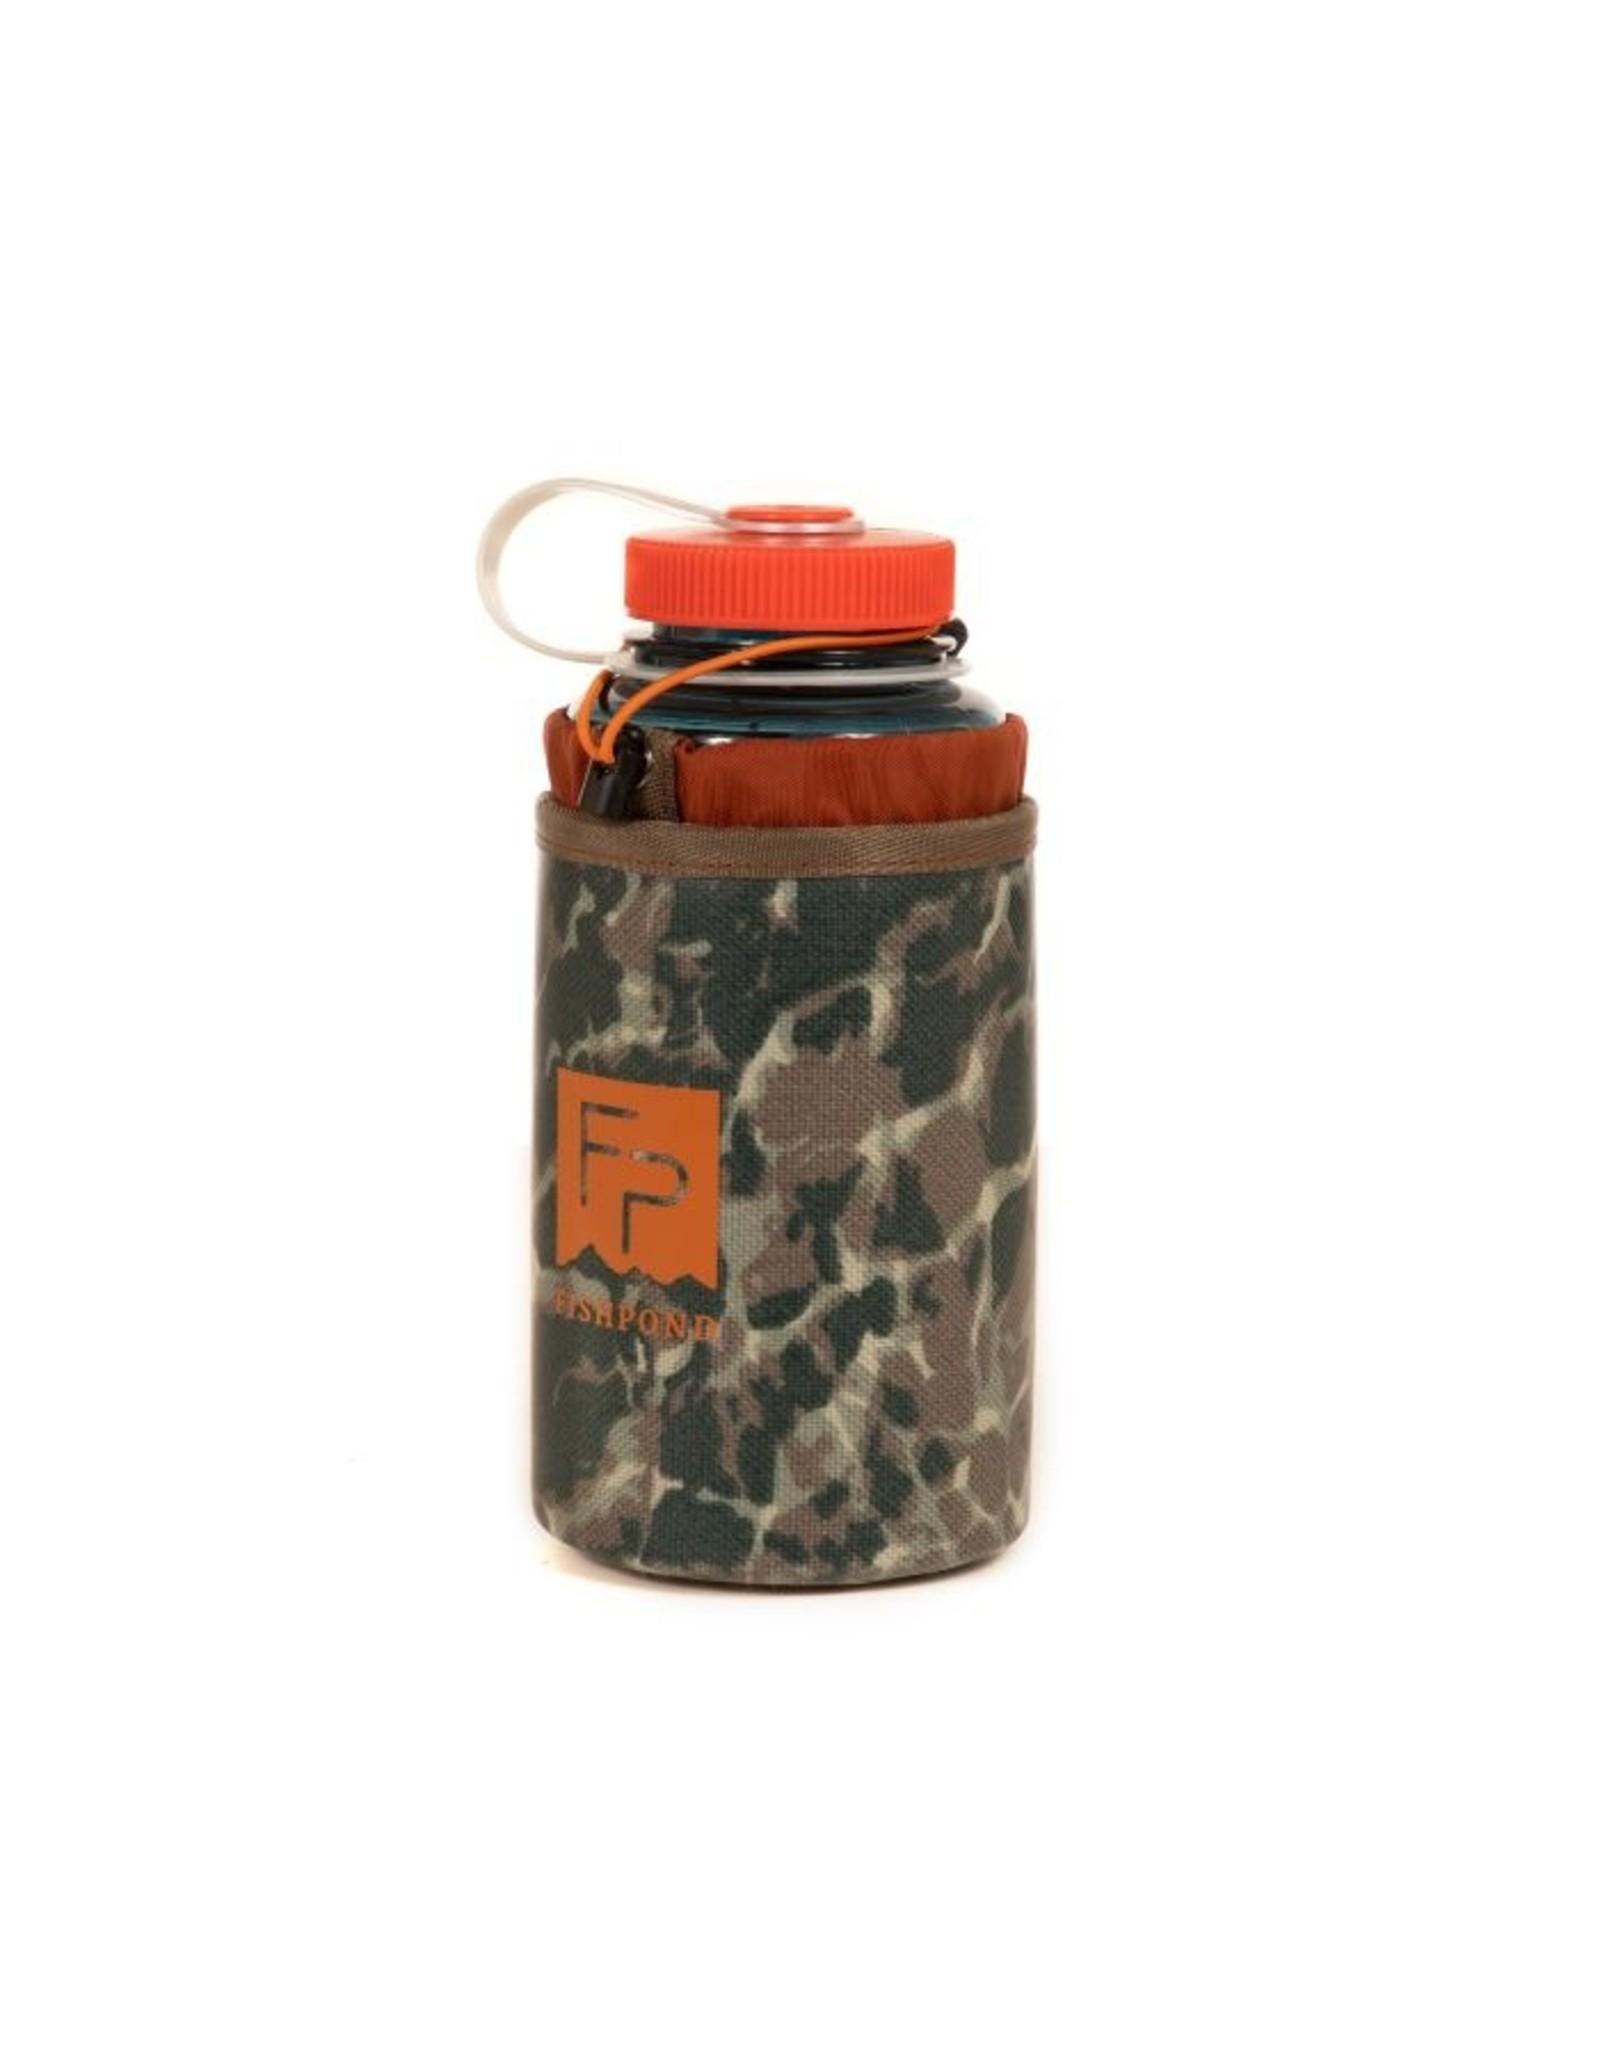 Fishpond Thunderhead Water Bottle Holder - Riverbed Camo